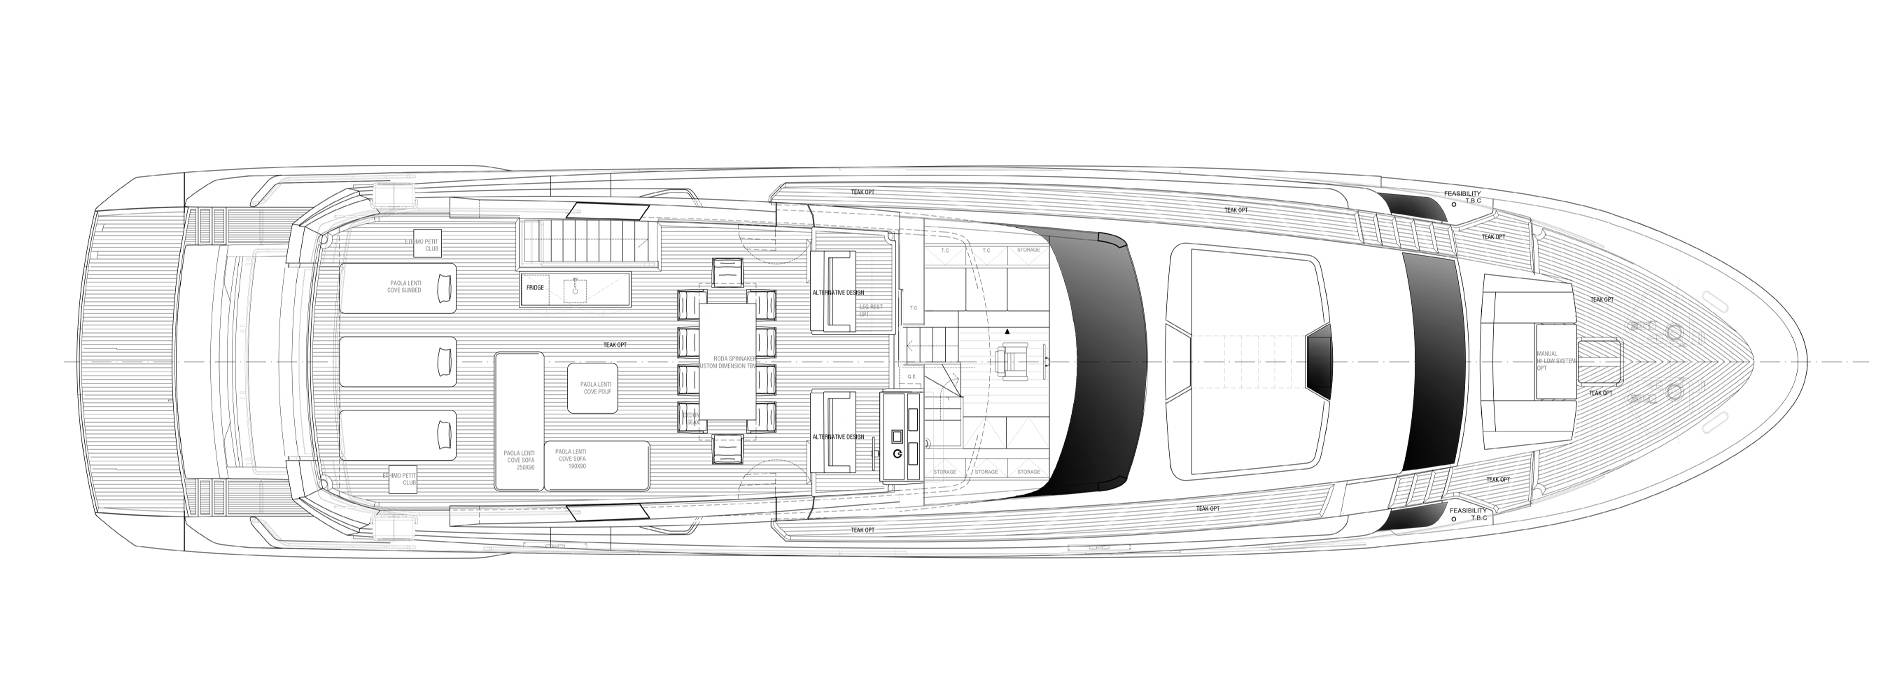 Sanlorenzo Yachts SL102A-746 飞桥